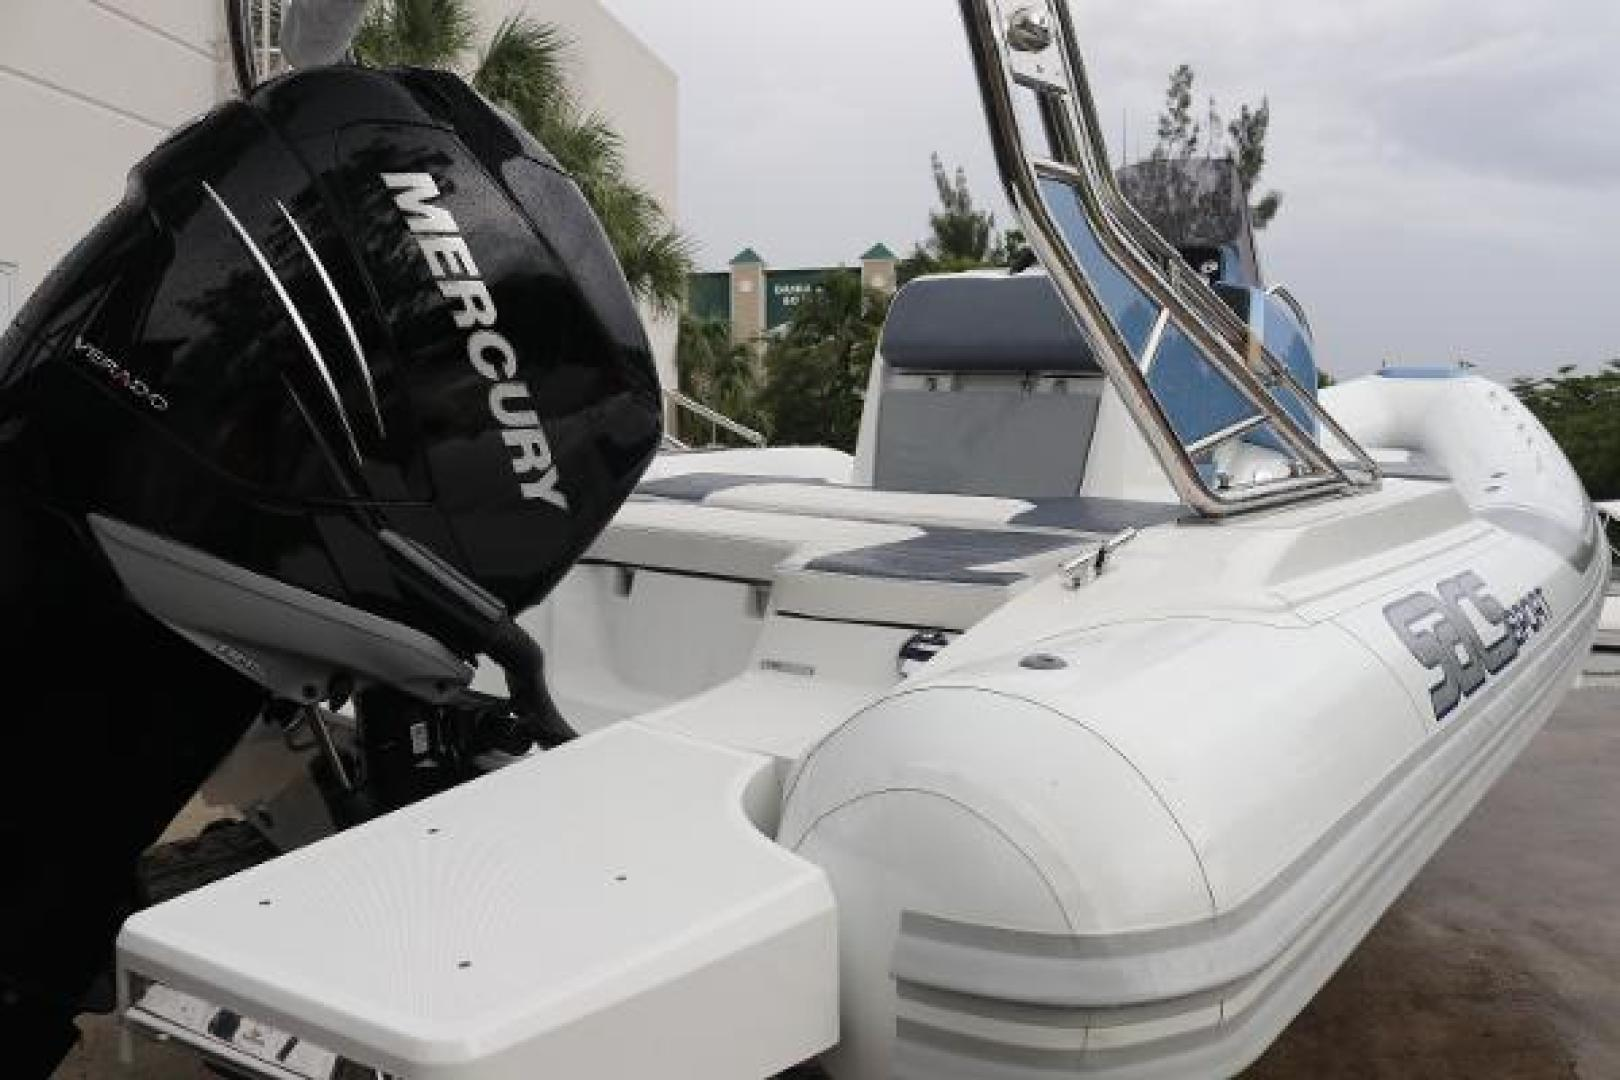 Sacs-Sport 700 2016-Sacs Sport 700 Fort Lauderdale-Florida-United States-1521583 | Thumbnail